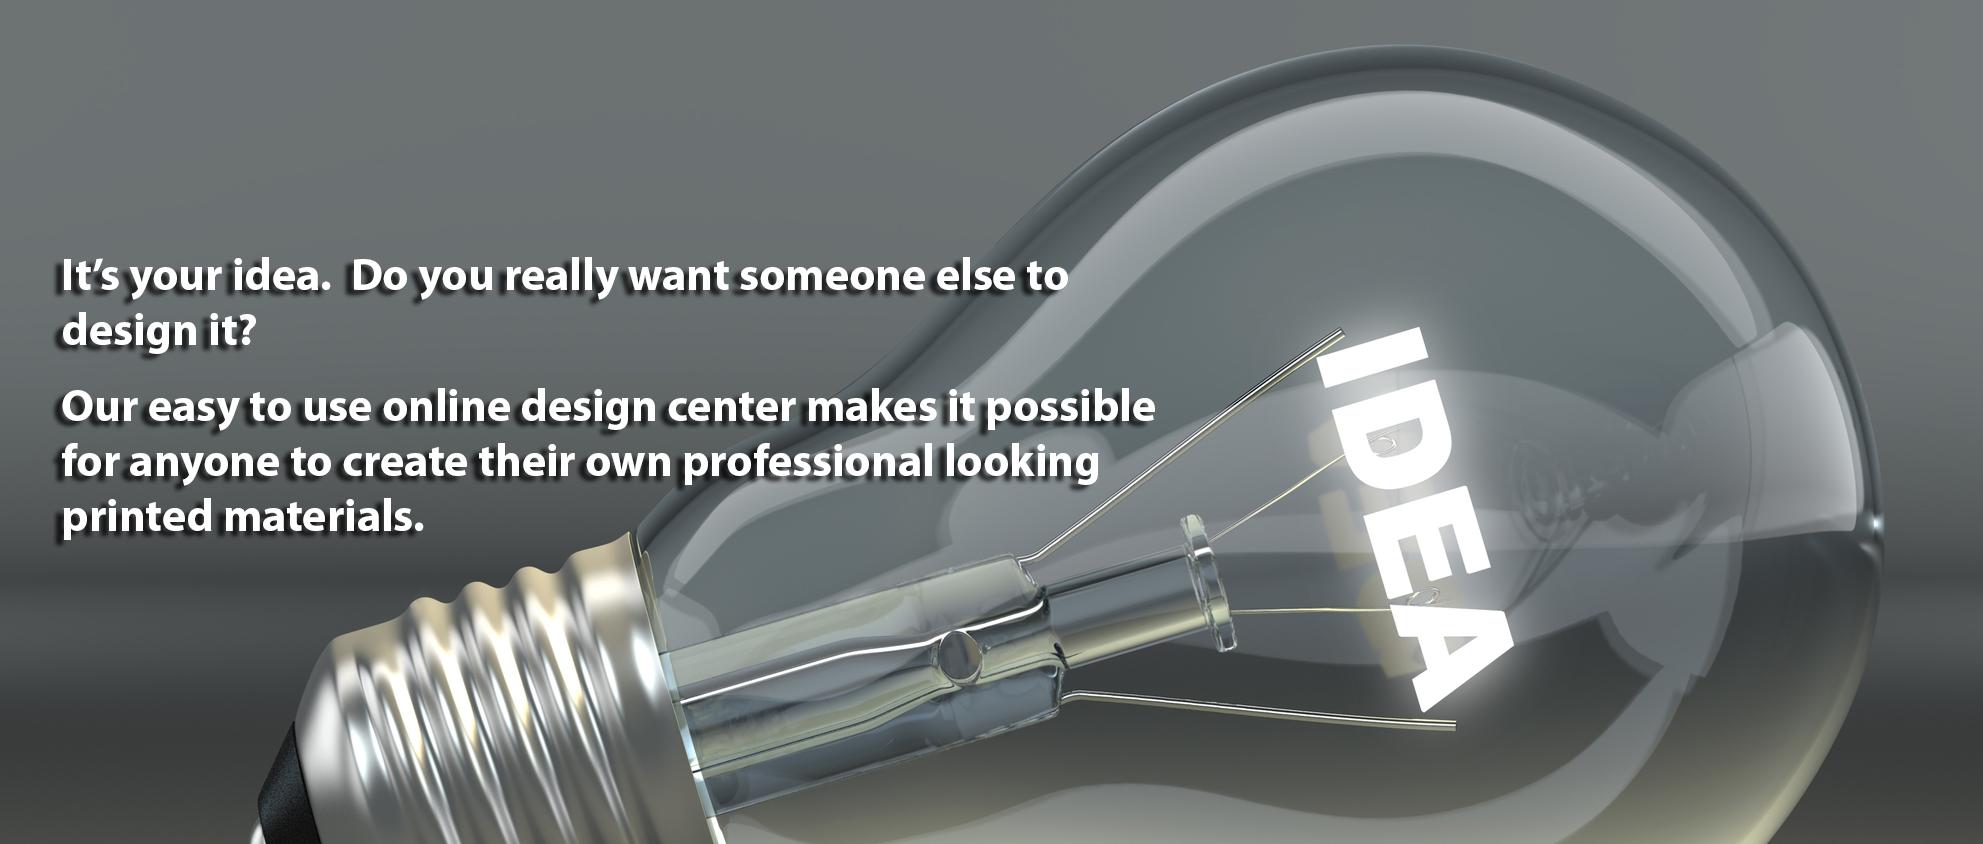 DIY - Design It Yourself!